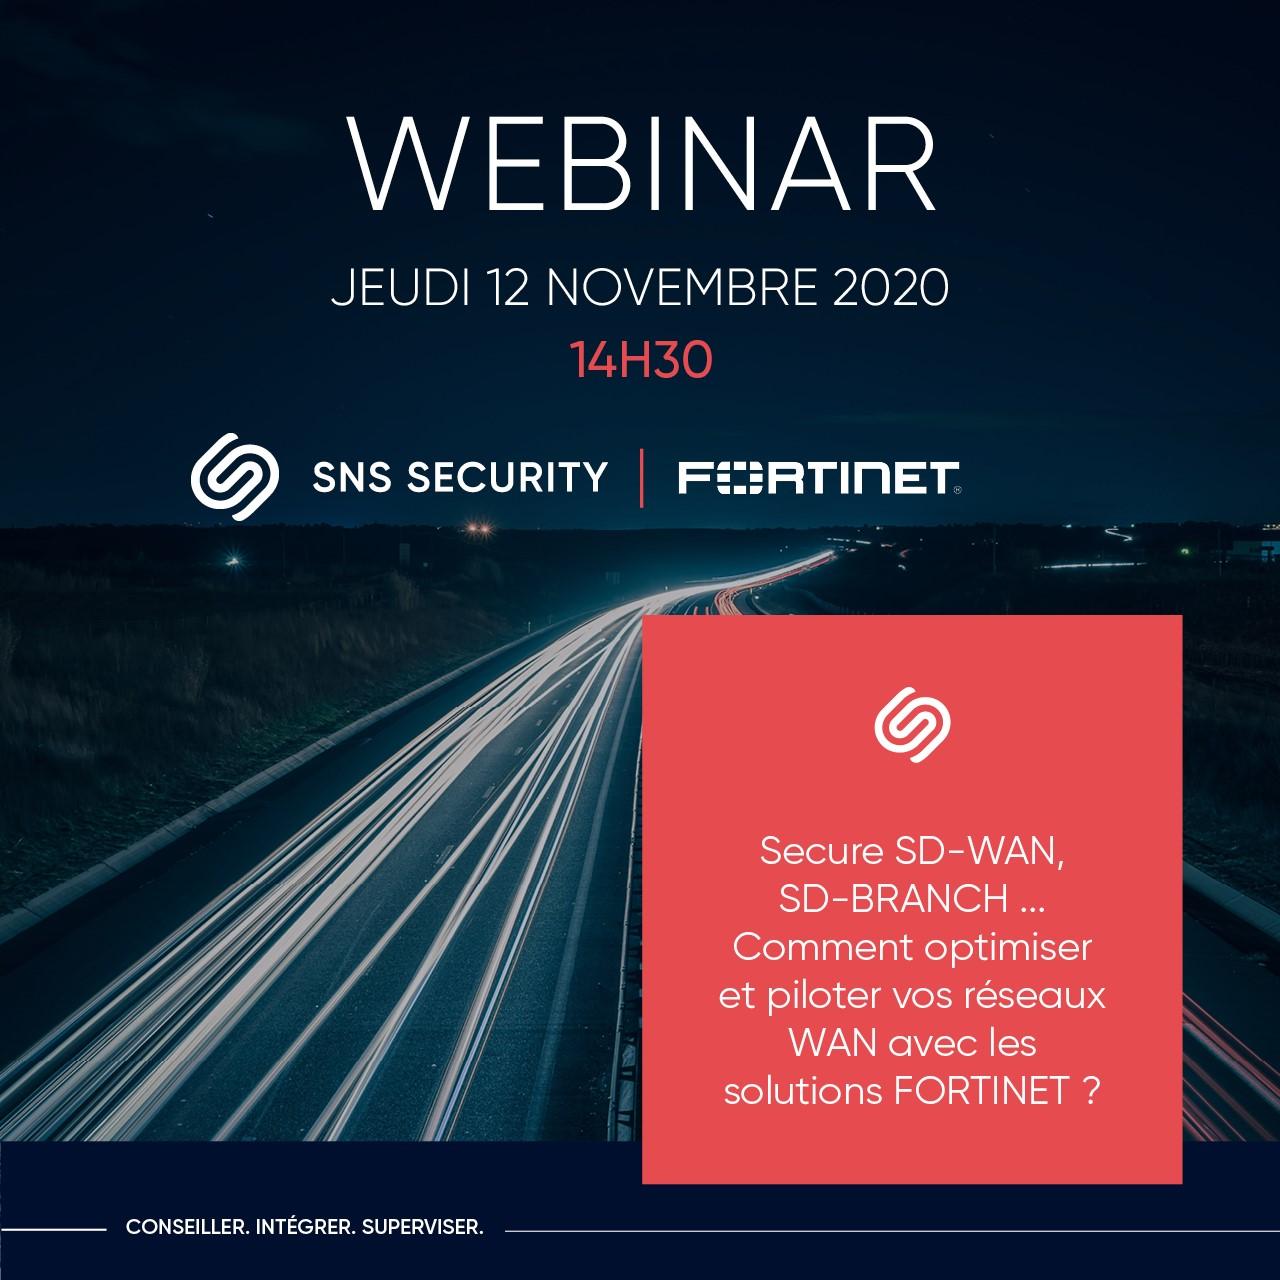 webinar sns security fortinet sdwan sdbranch 12 octobre